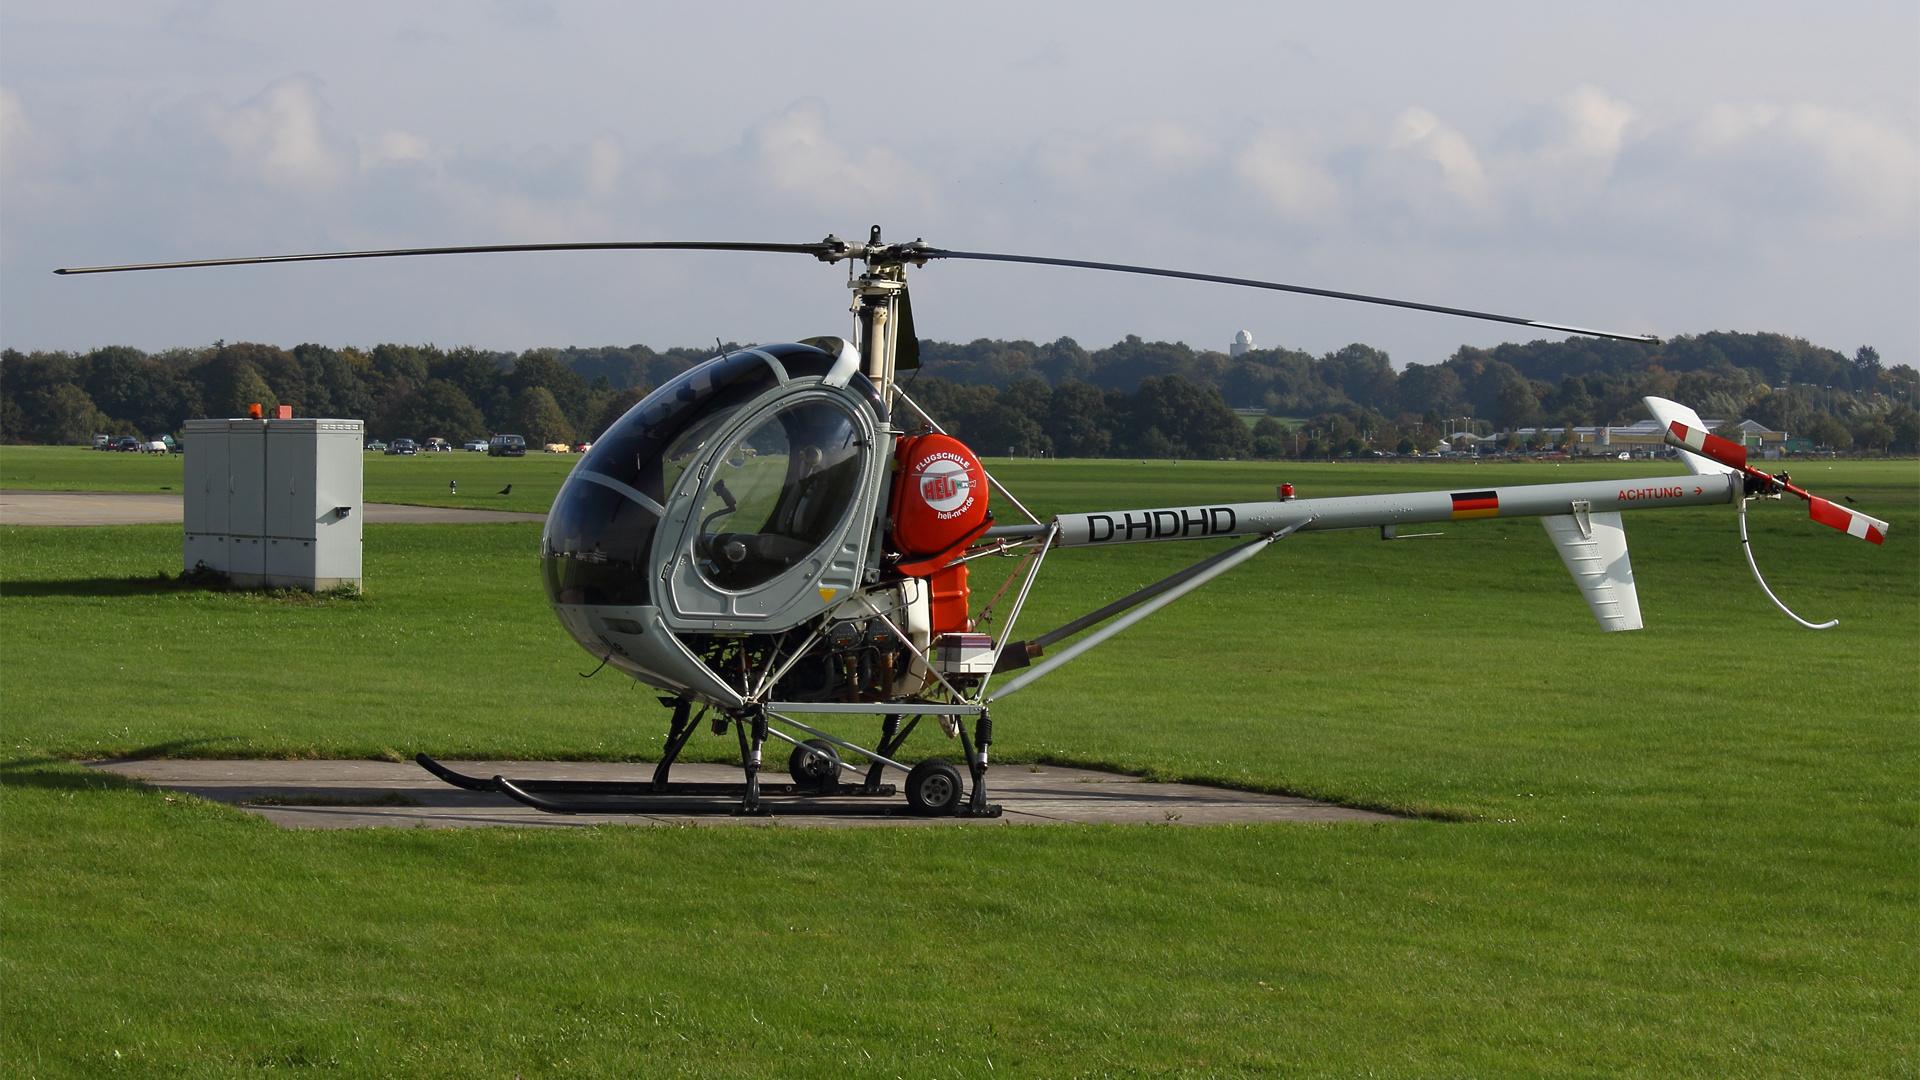 D-HDHD-1 Schweizer300 ESS 201310